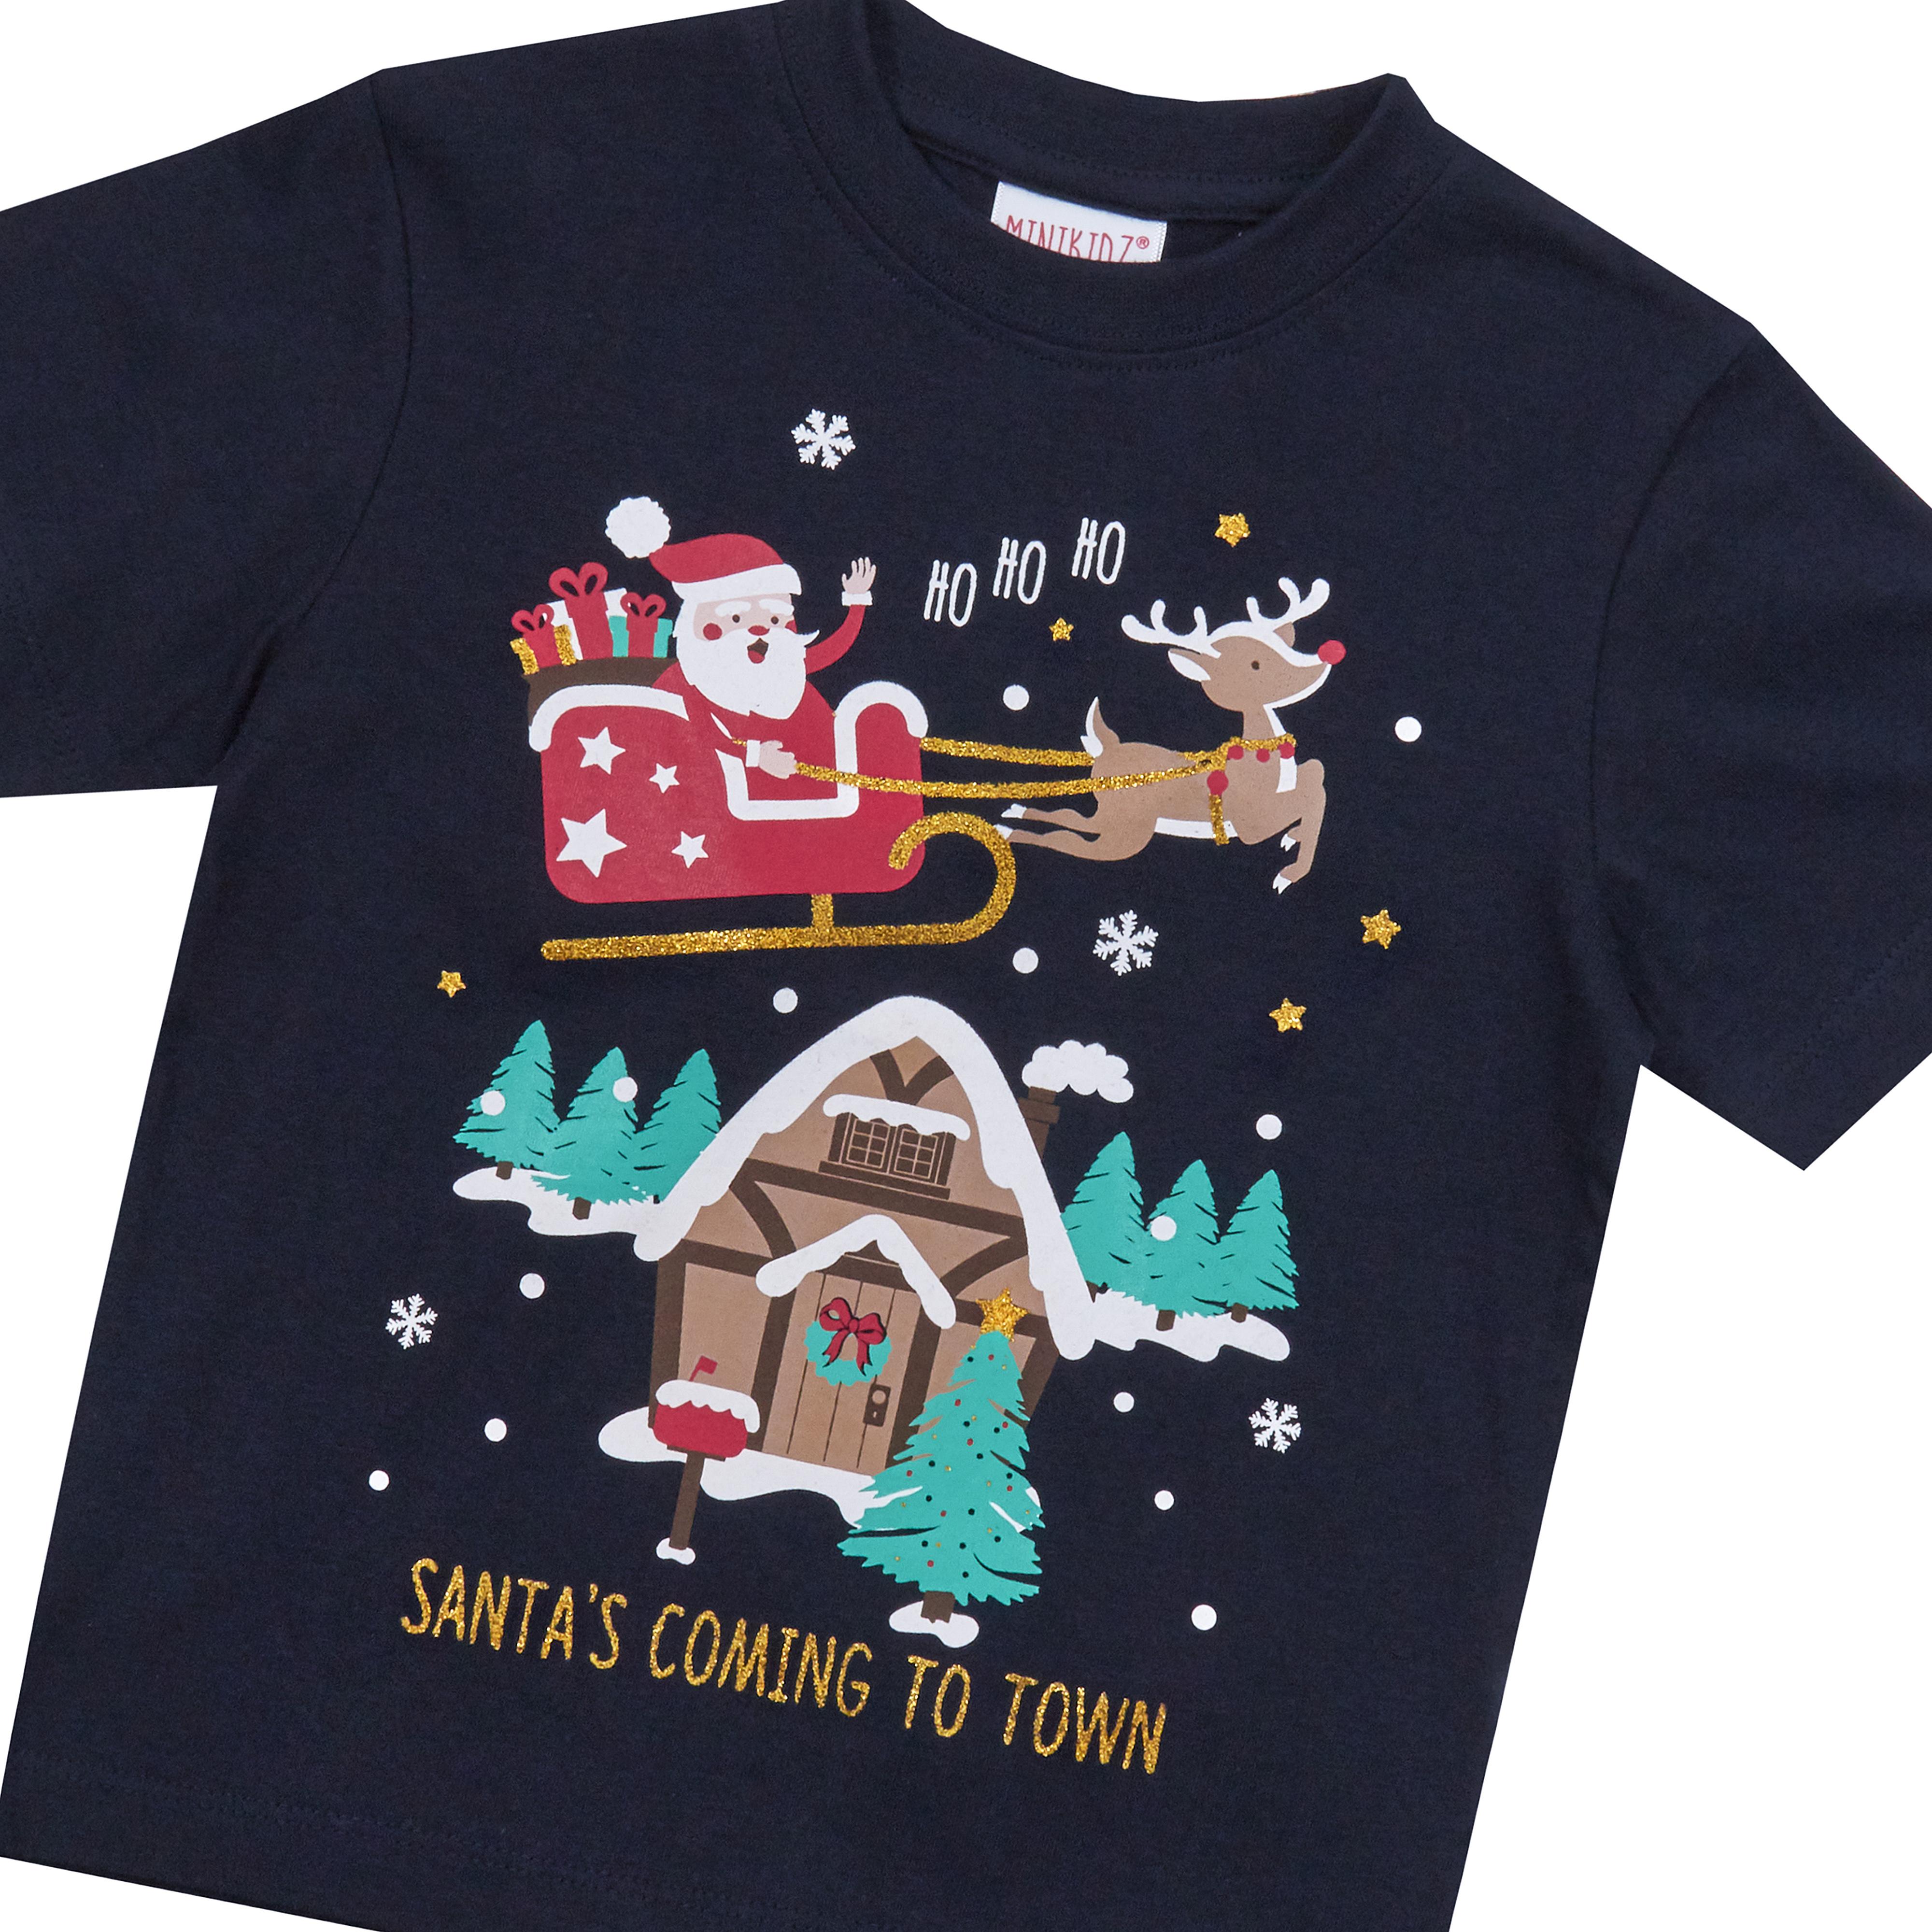 Childrens-Girls-Boys-Xmas-T-Shirts-Printed-Christmas-Design-100-Cotton-2-13-Yrs thumbnail 16